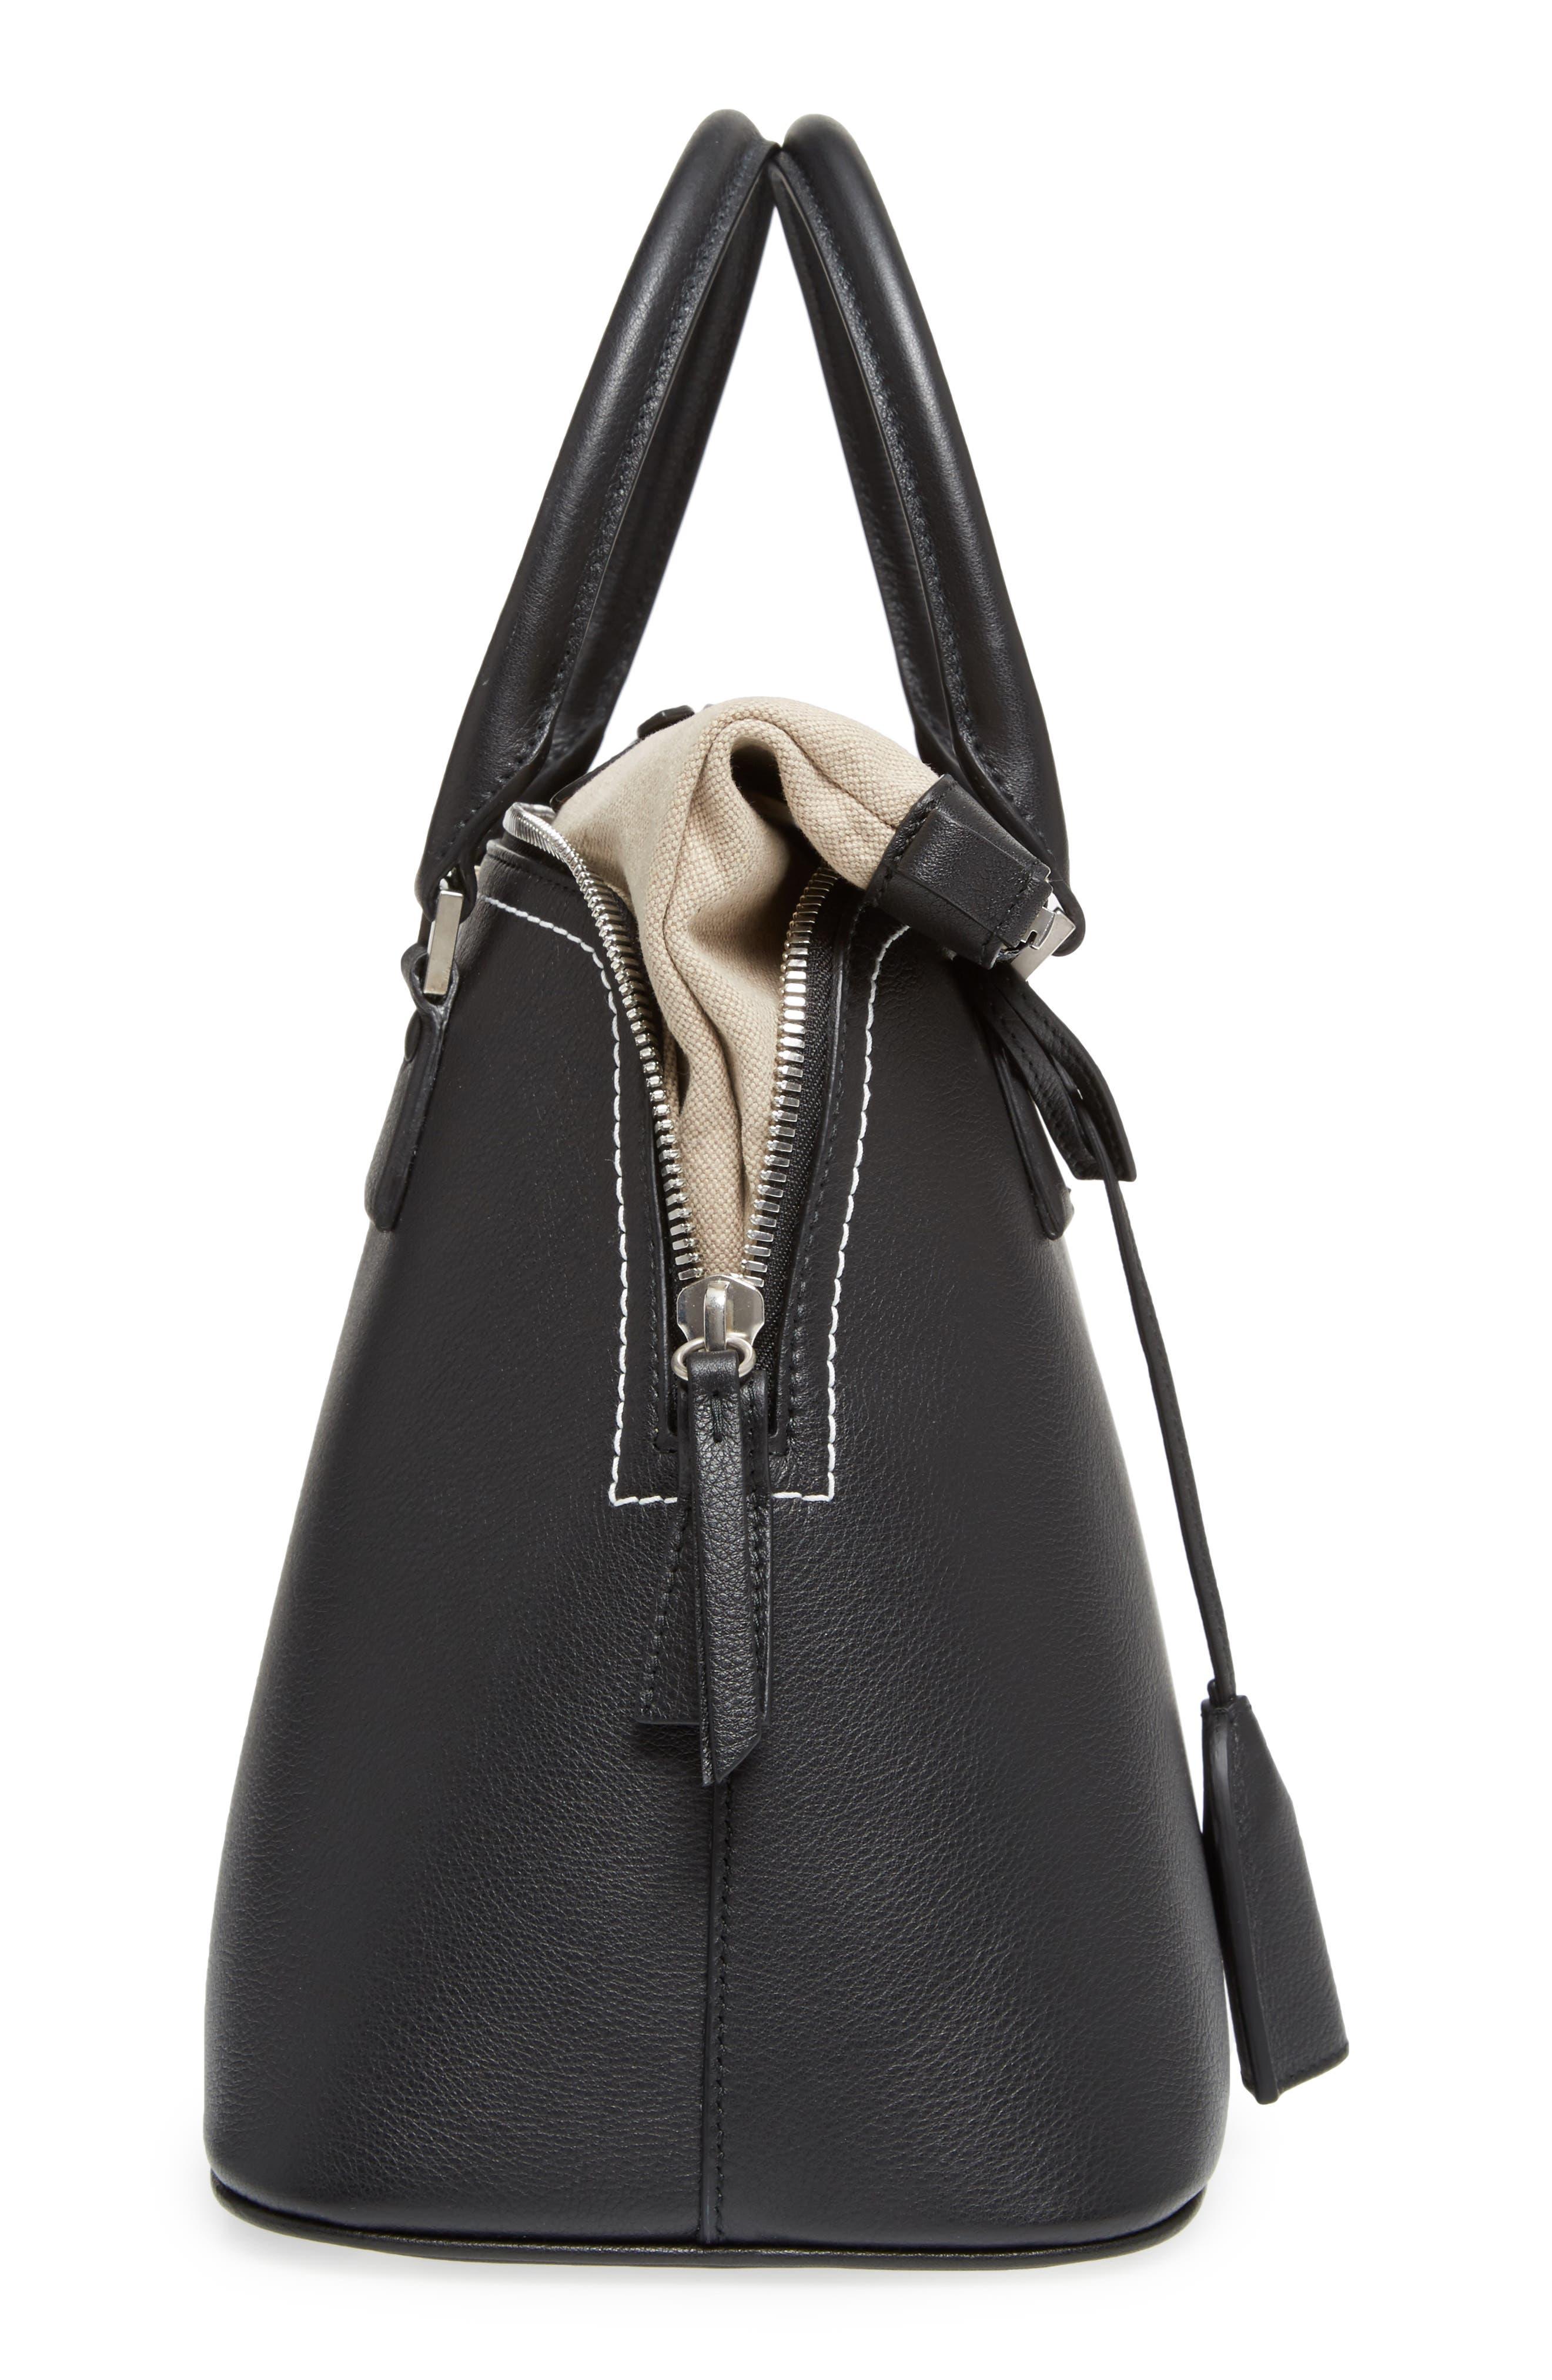 Medium 5AC Leather Handbag,                             Alternate thumbnail 5, color,                             Black